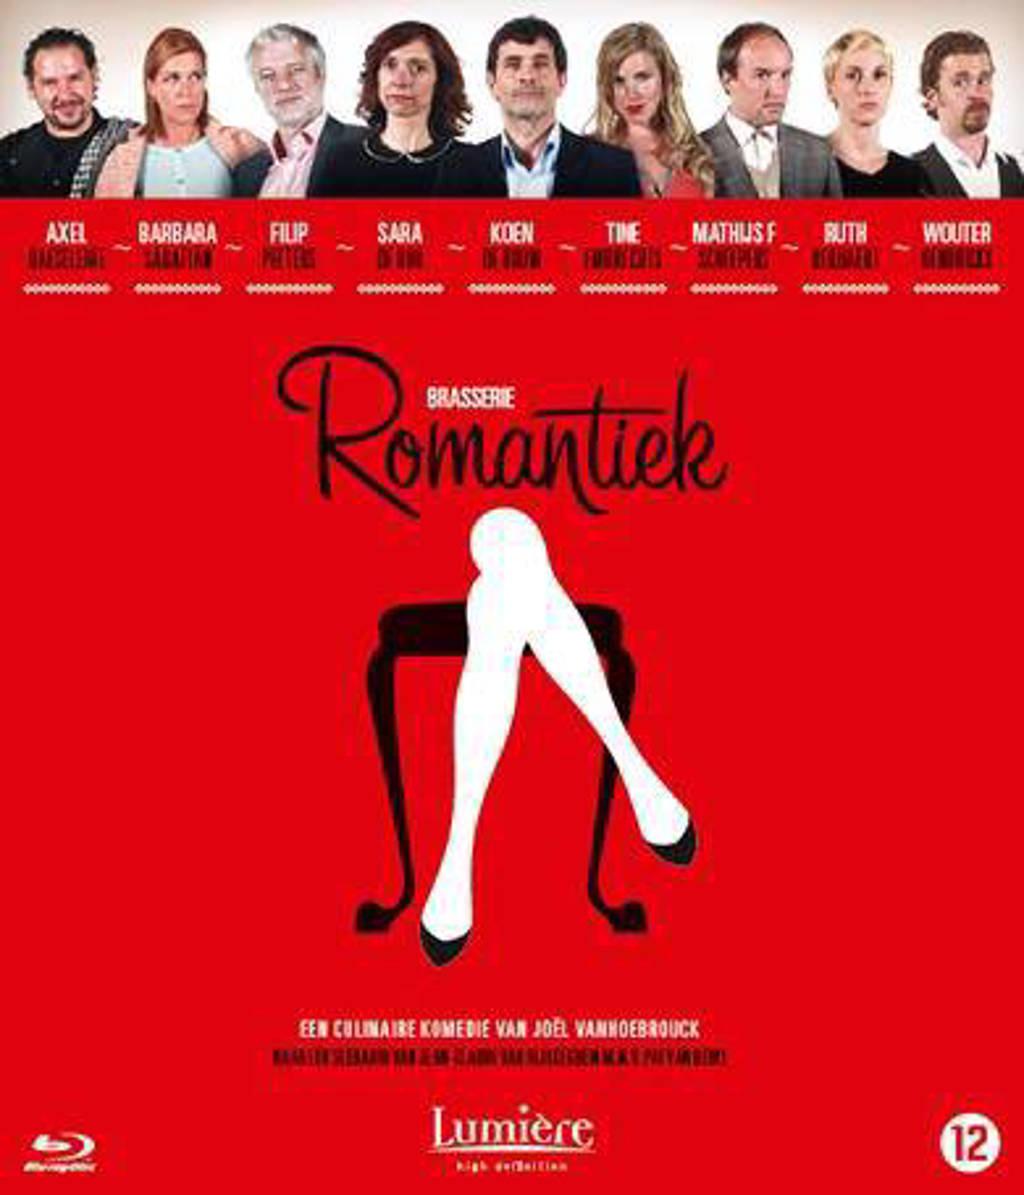 Brasserie romantiek (Blu-ray)